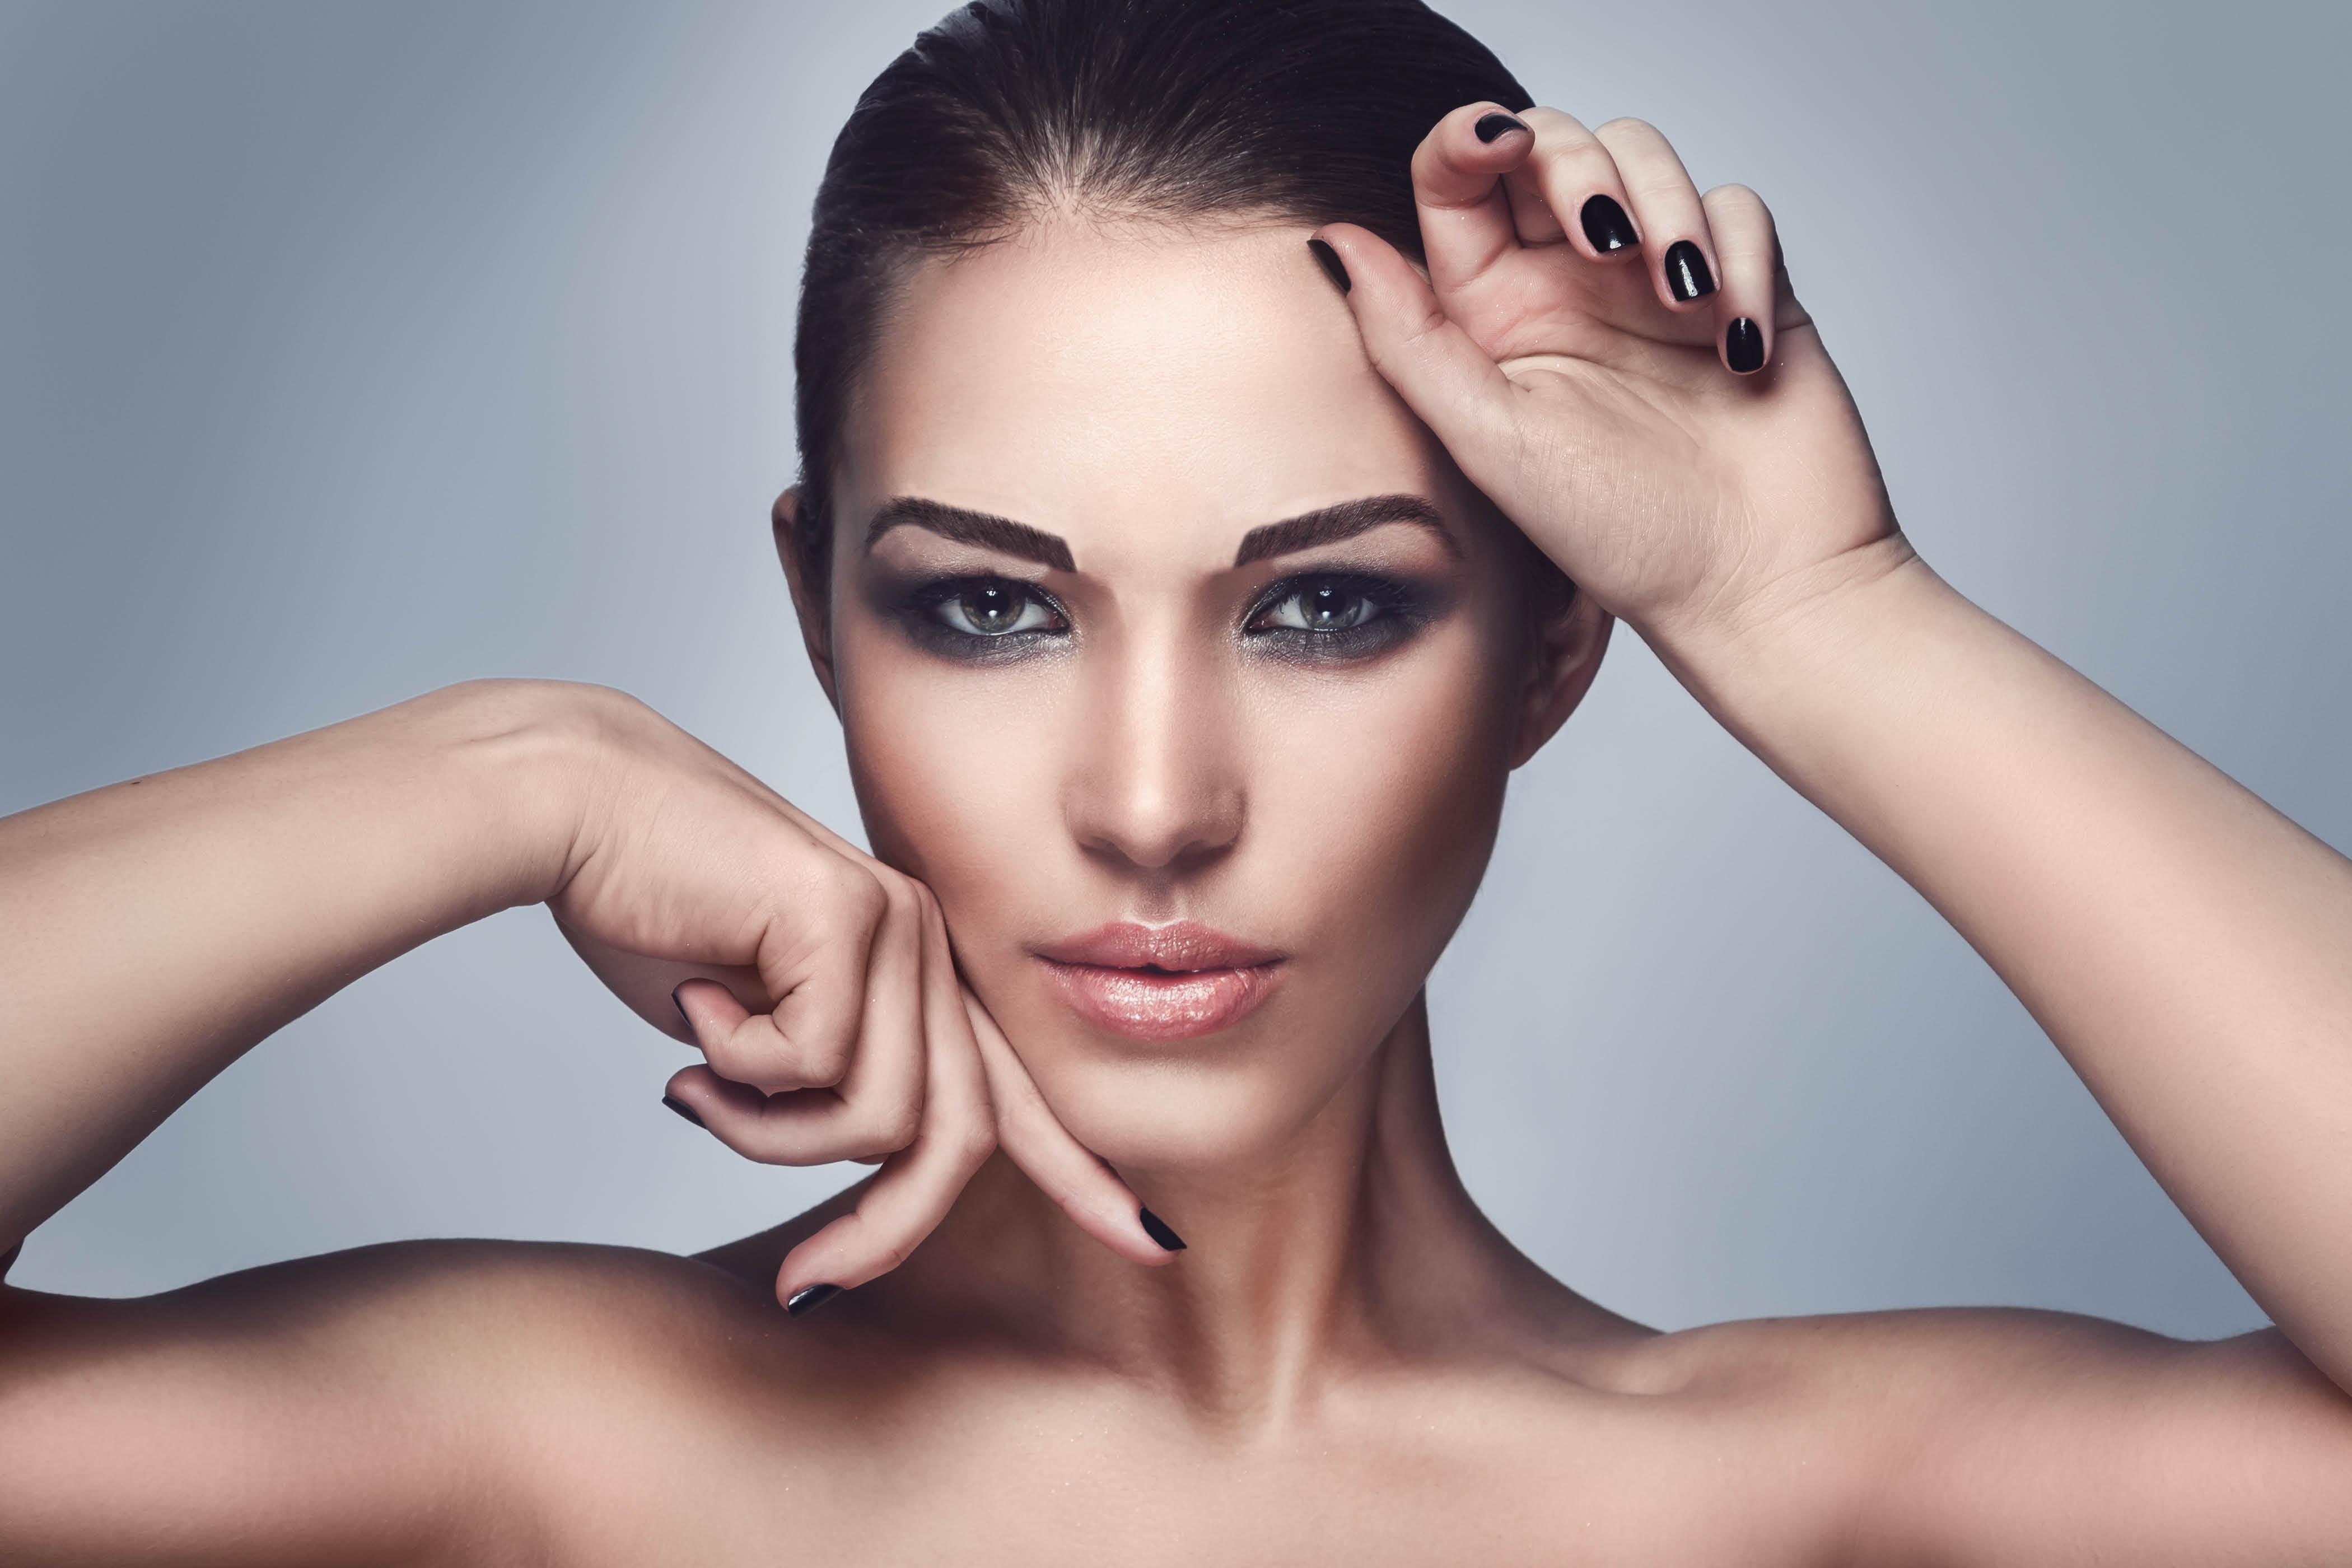 Ger Beautiful Flawless skin, get rid or wrinkles, rejuvenate your skin in AZ